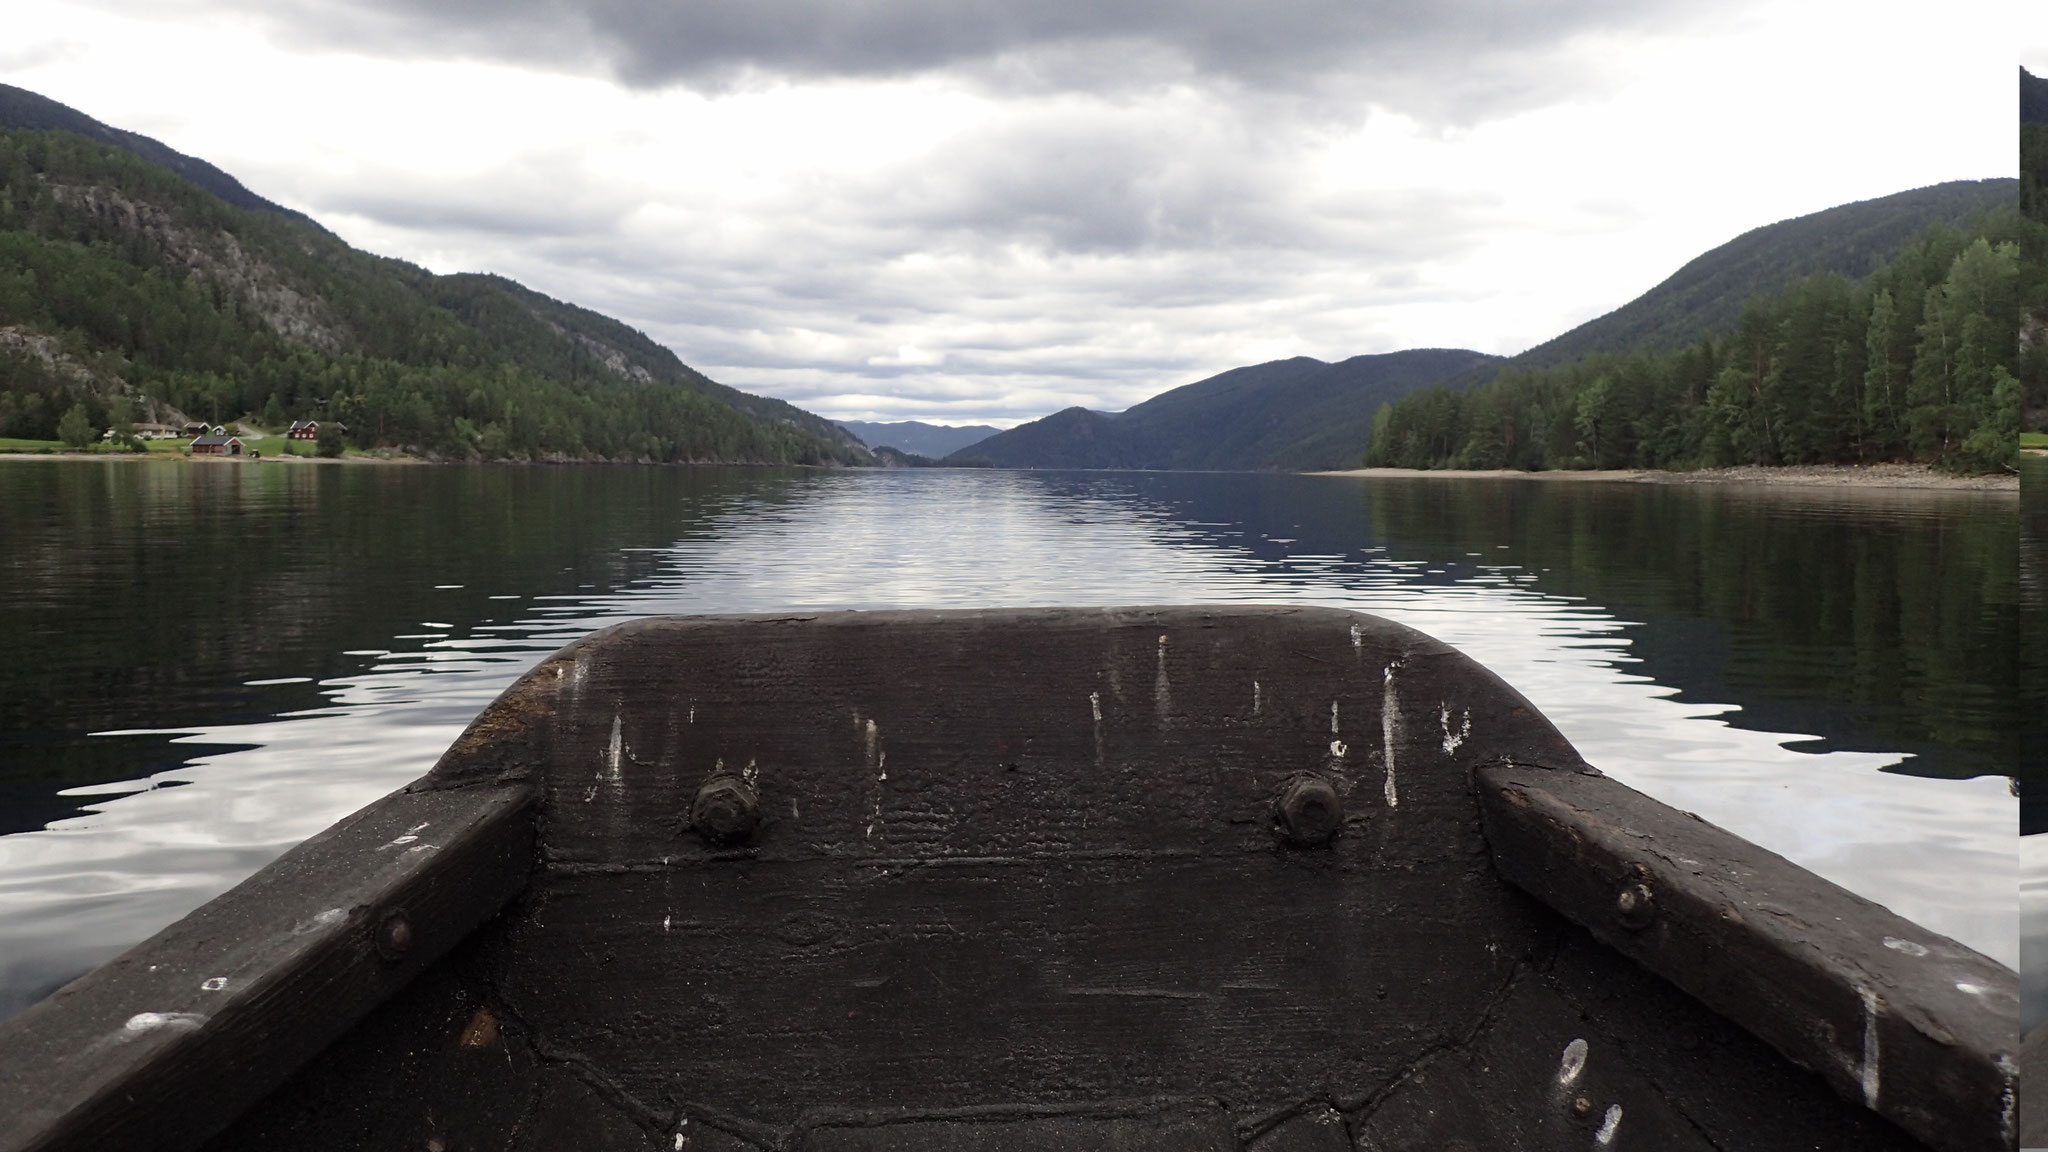 båttur med vakker utsikt